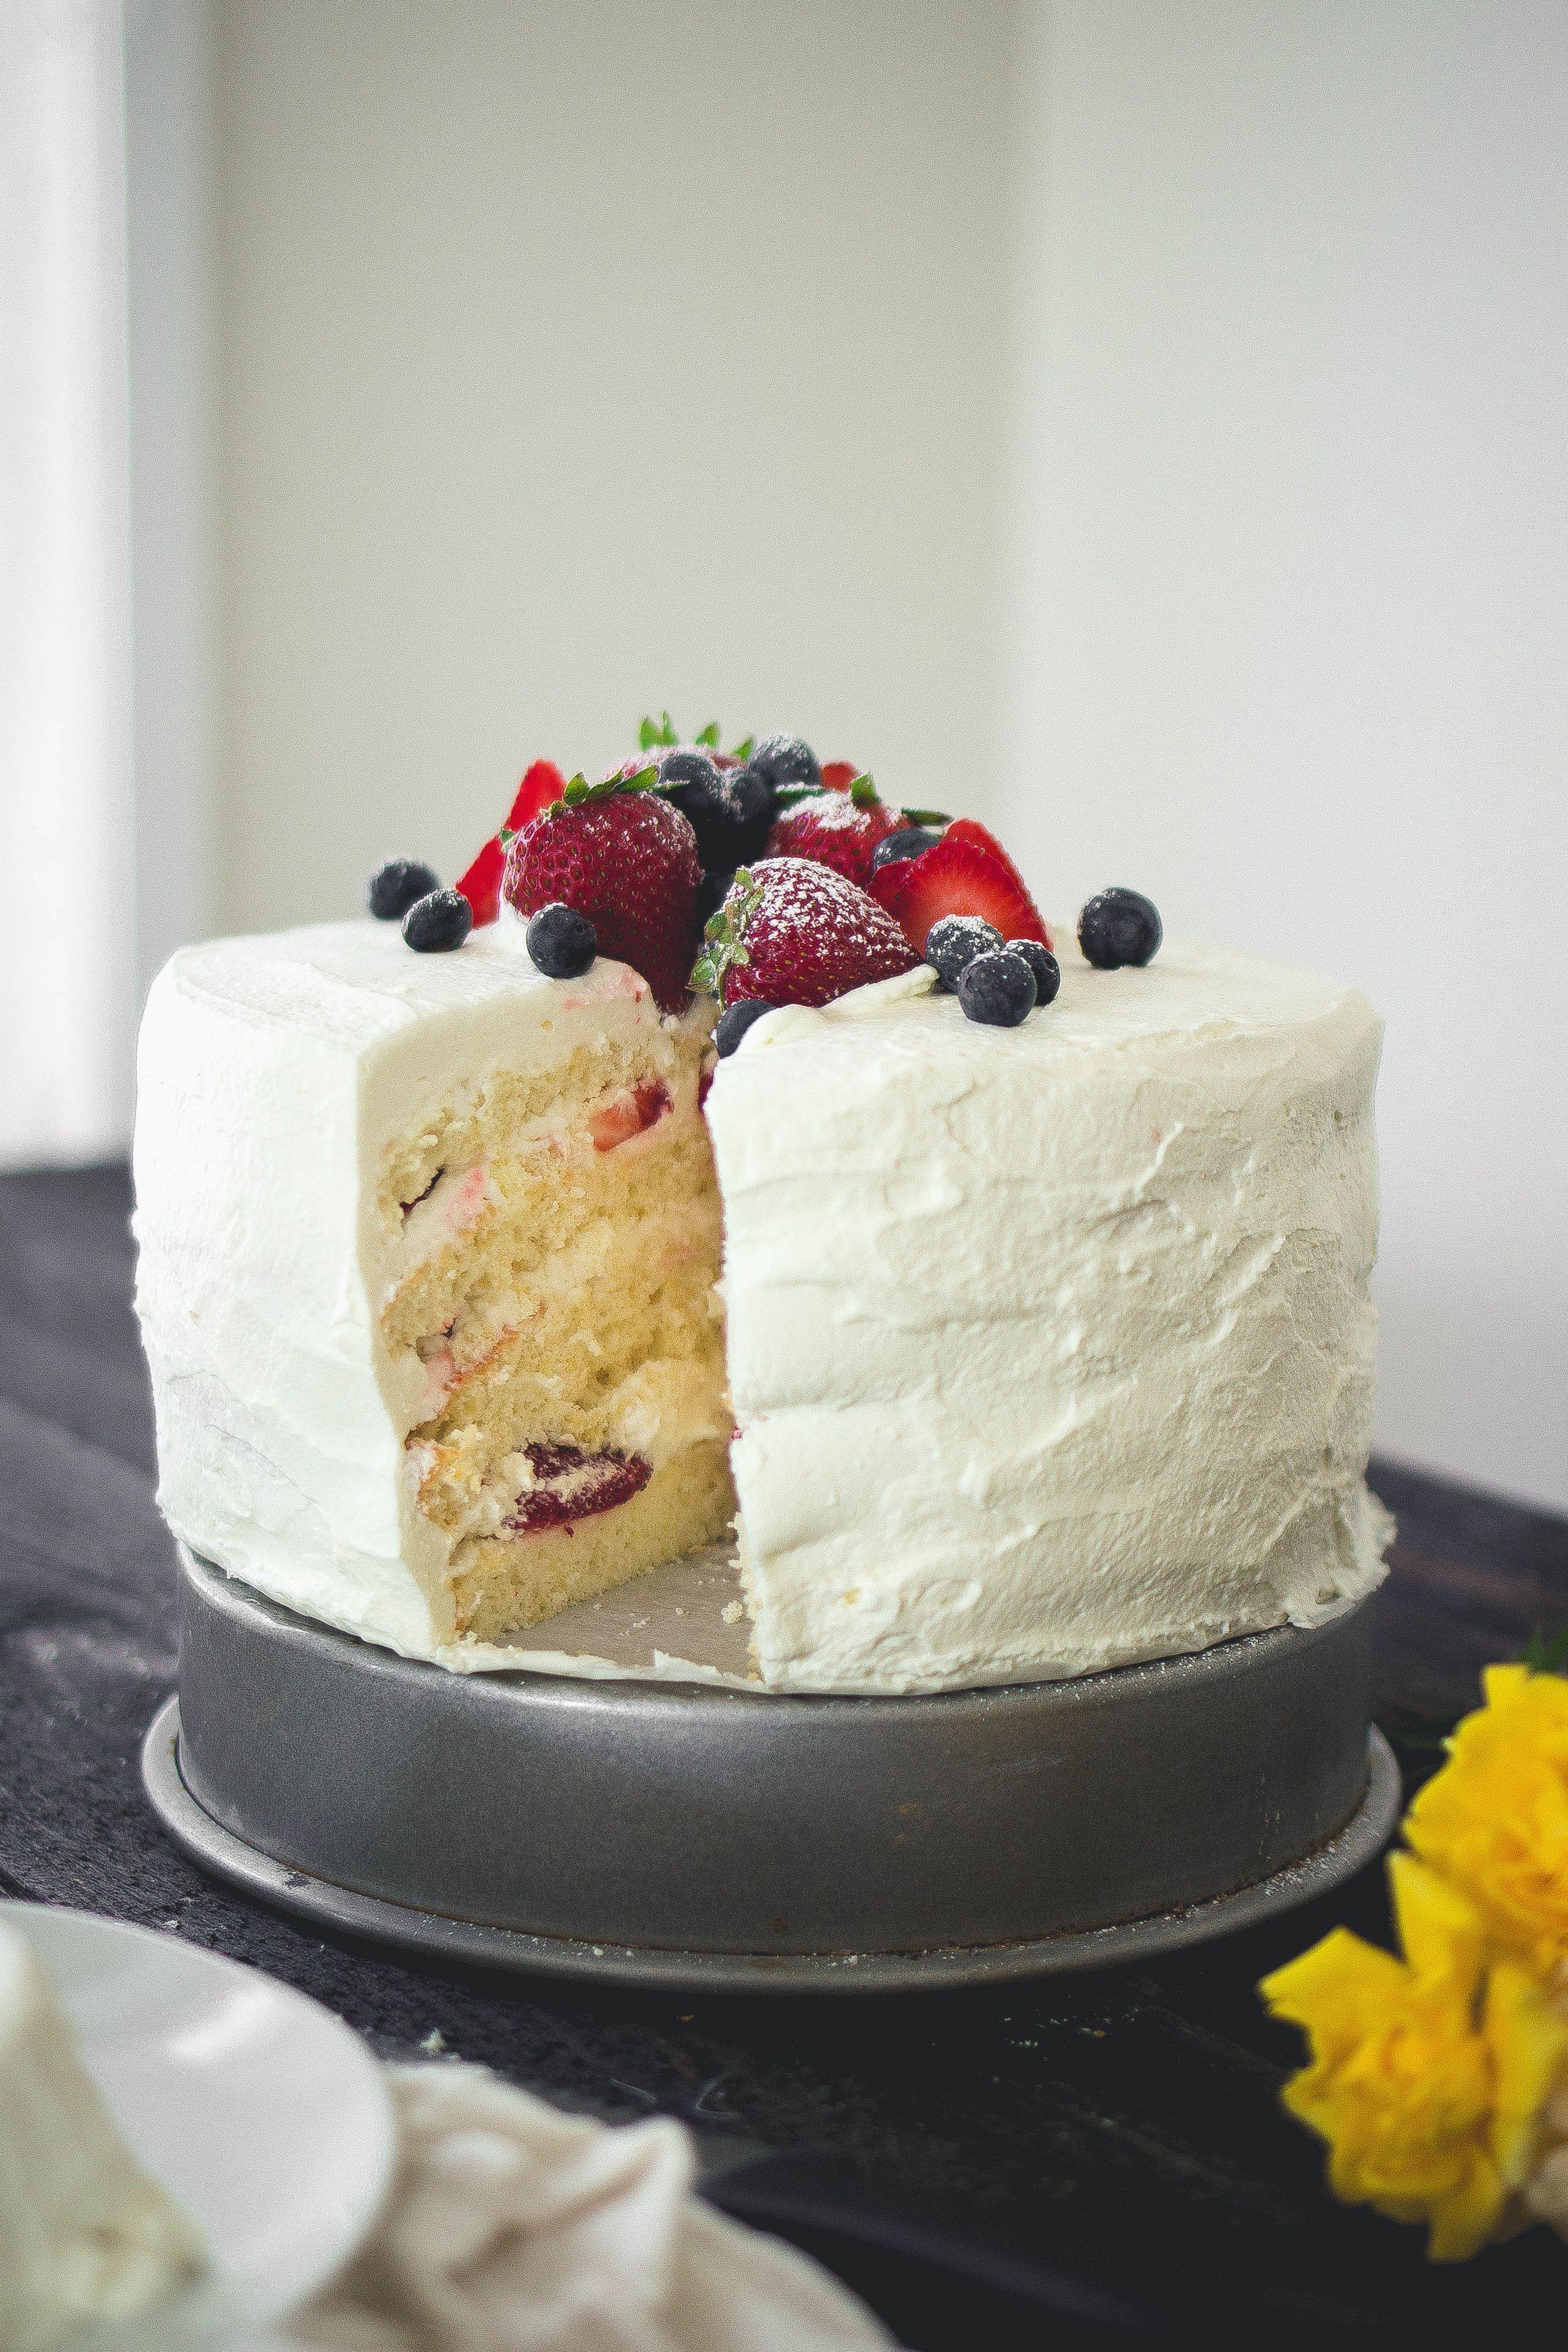 Sponge Saeng Cream Fruit Cake